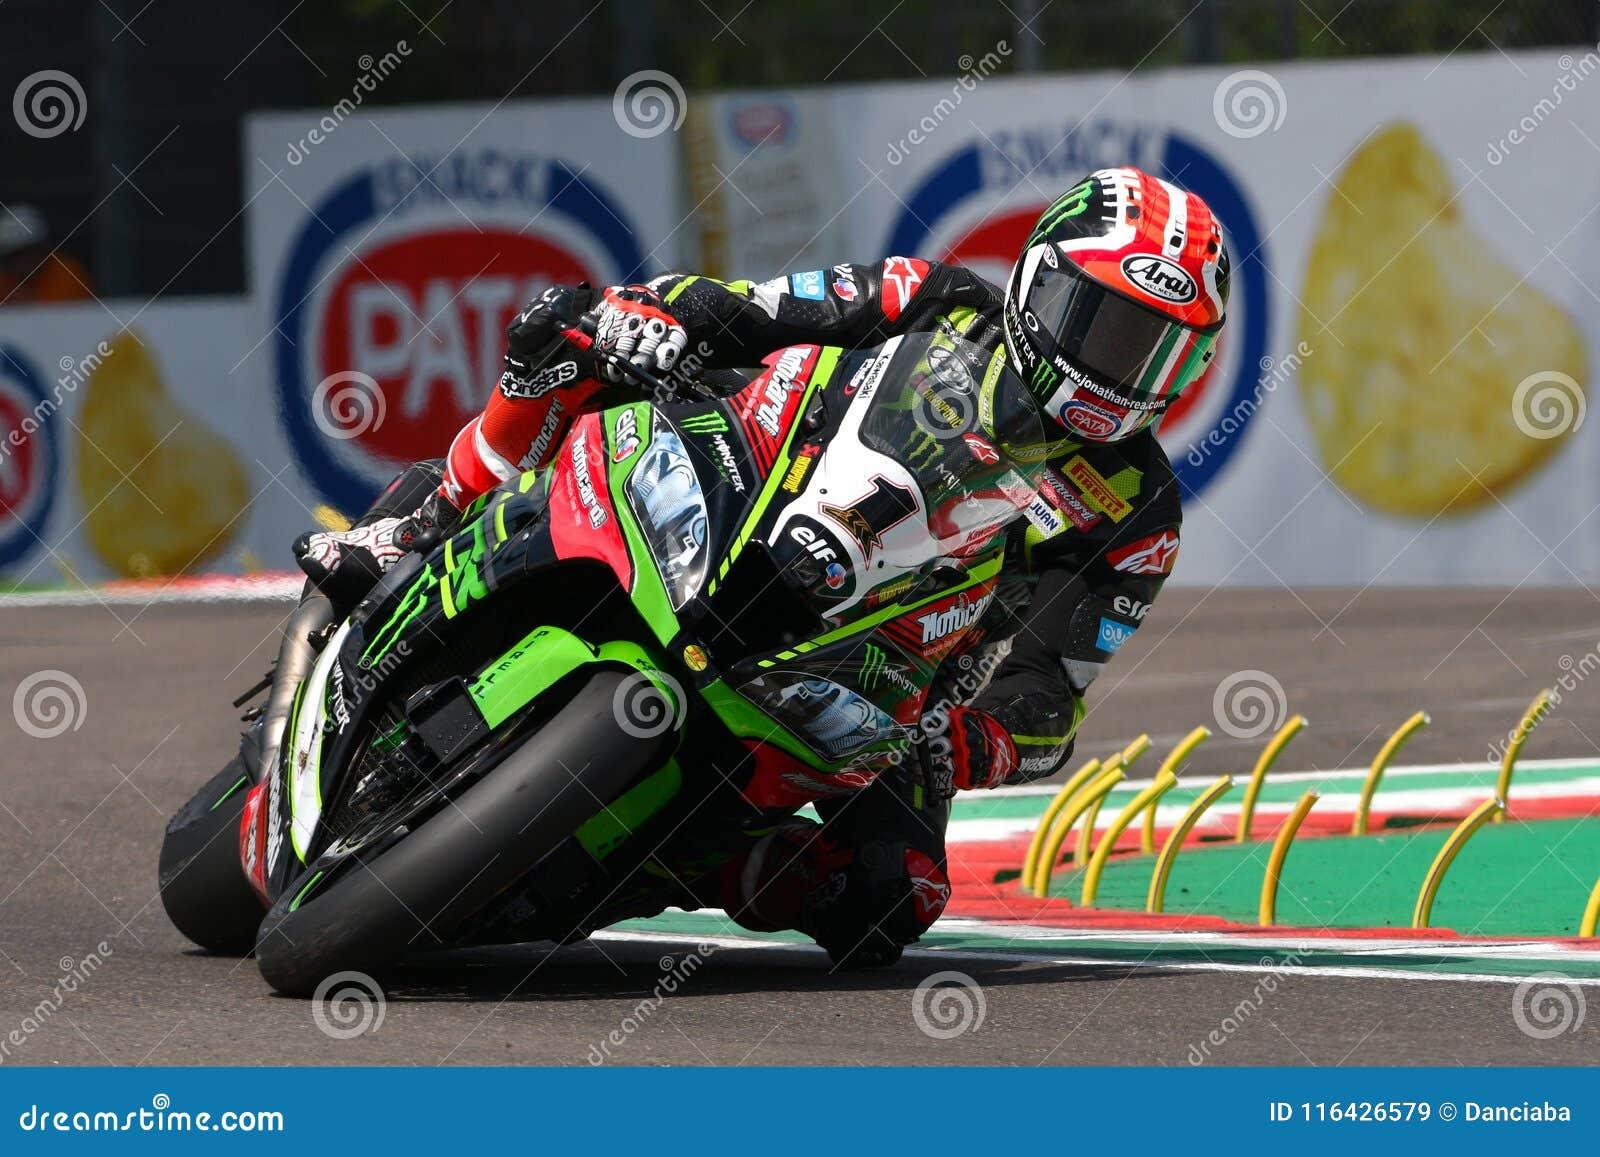 San Marino Italy - Maj 11, 2018: Jonathan Rea GBR Kawasaki ZX-10RR Kawasaki Racing Team, i handling under Superbikekvalificeringe